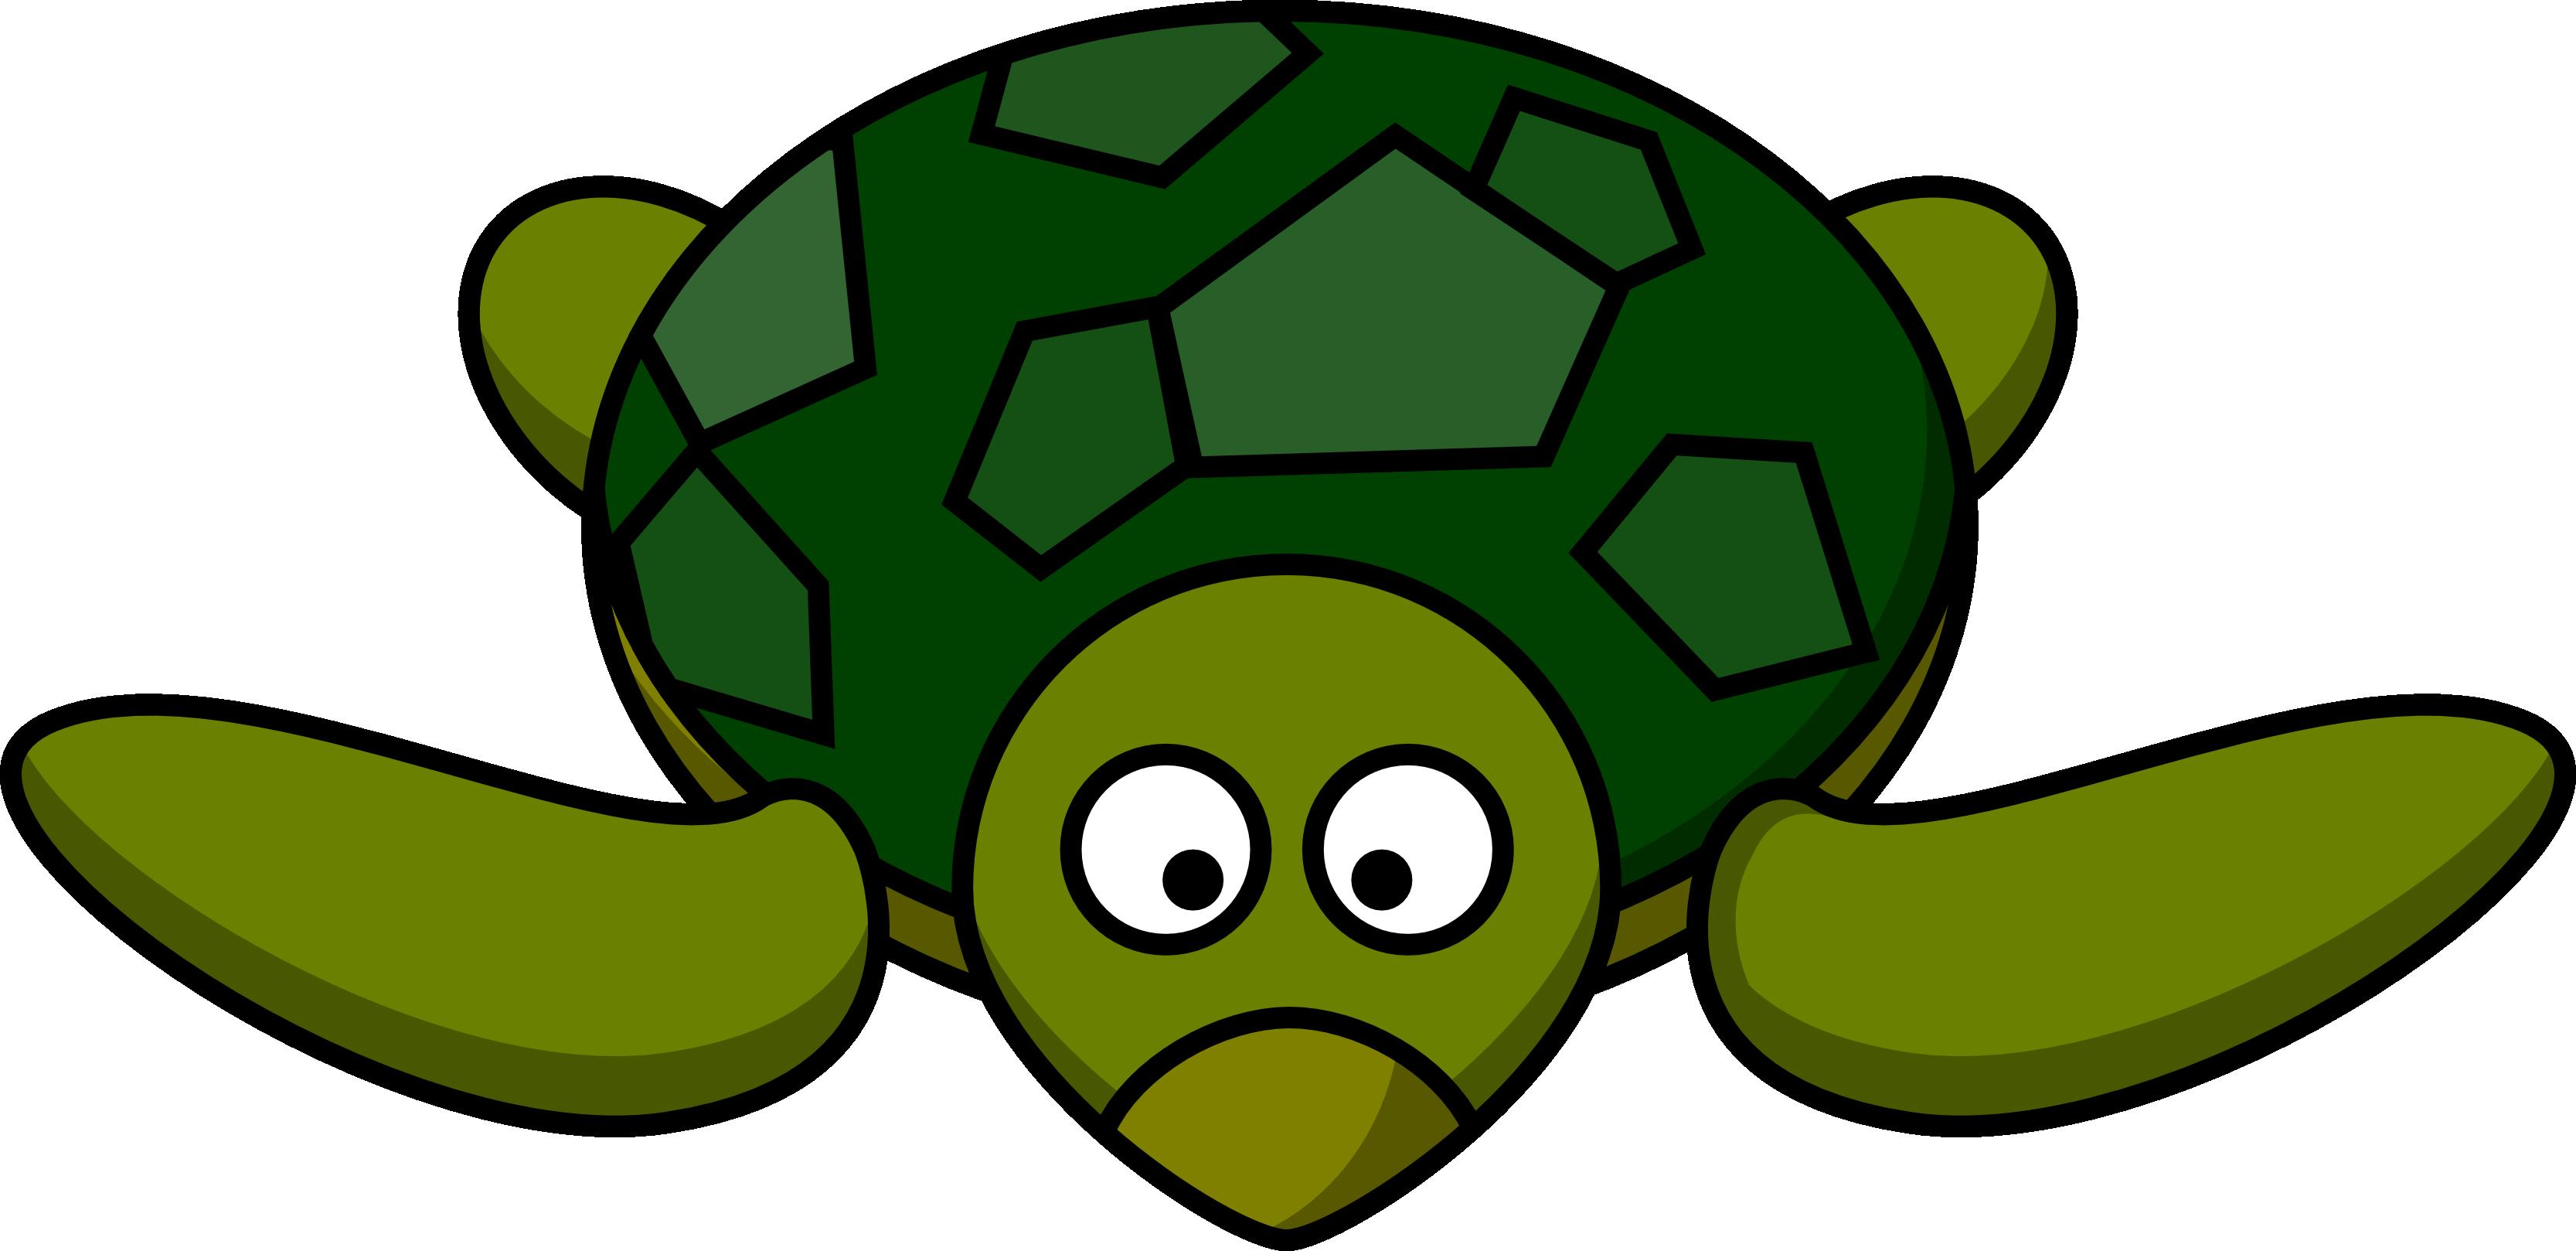 Clipart turtle shape. Clip art of turtules